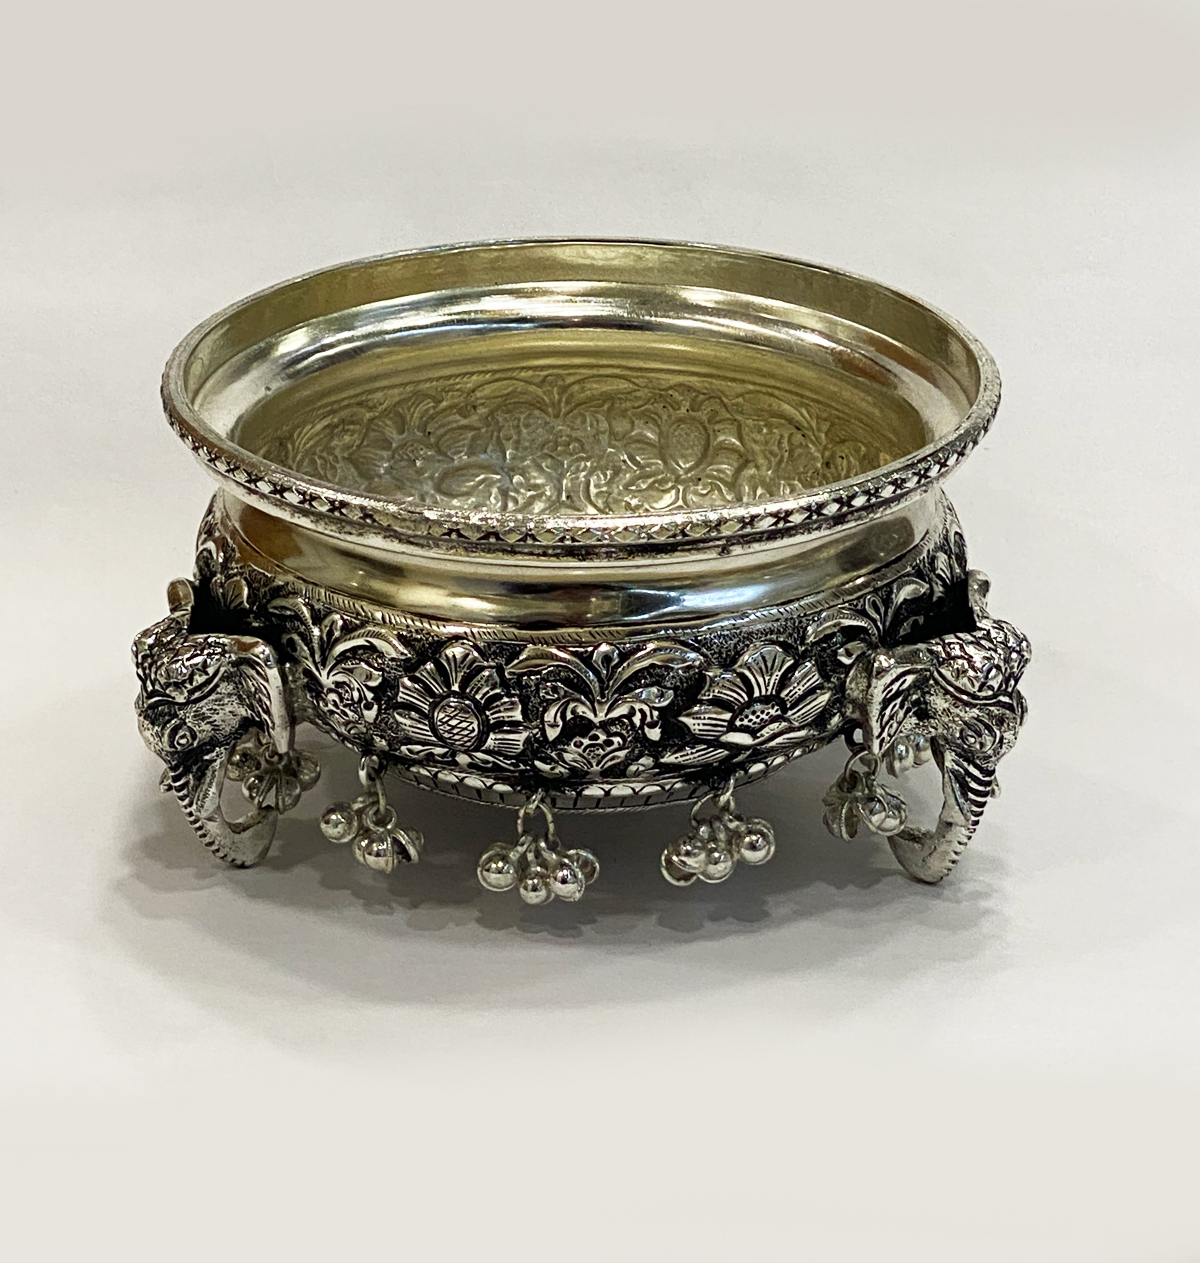 Artistic Silver Plated Bowl or Urli   5.5 Inch